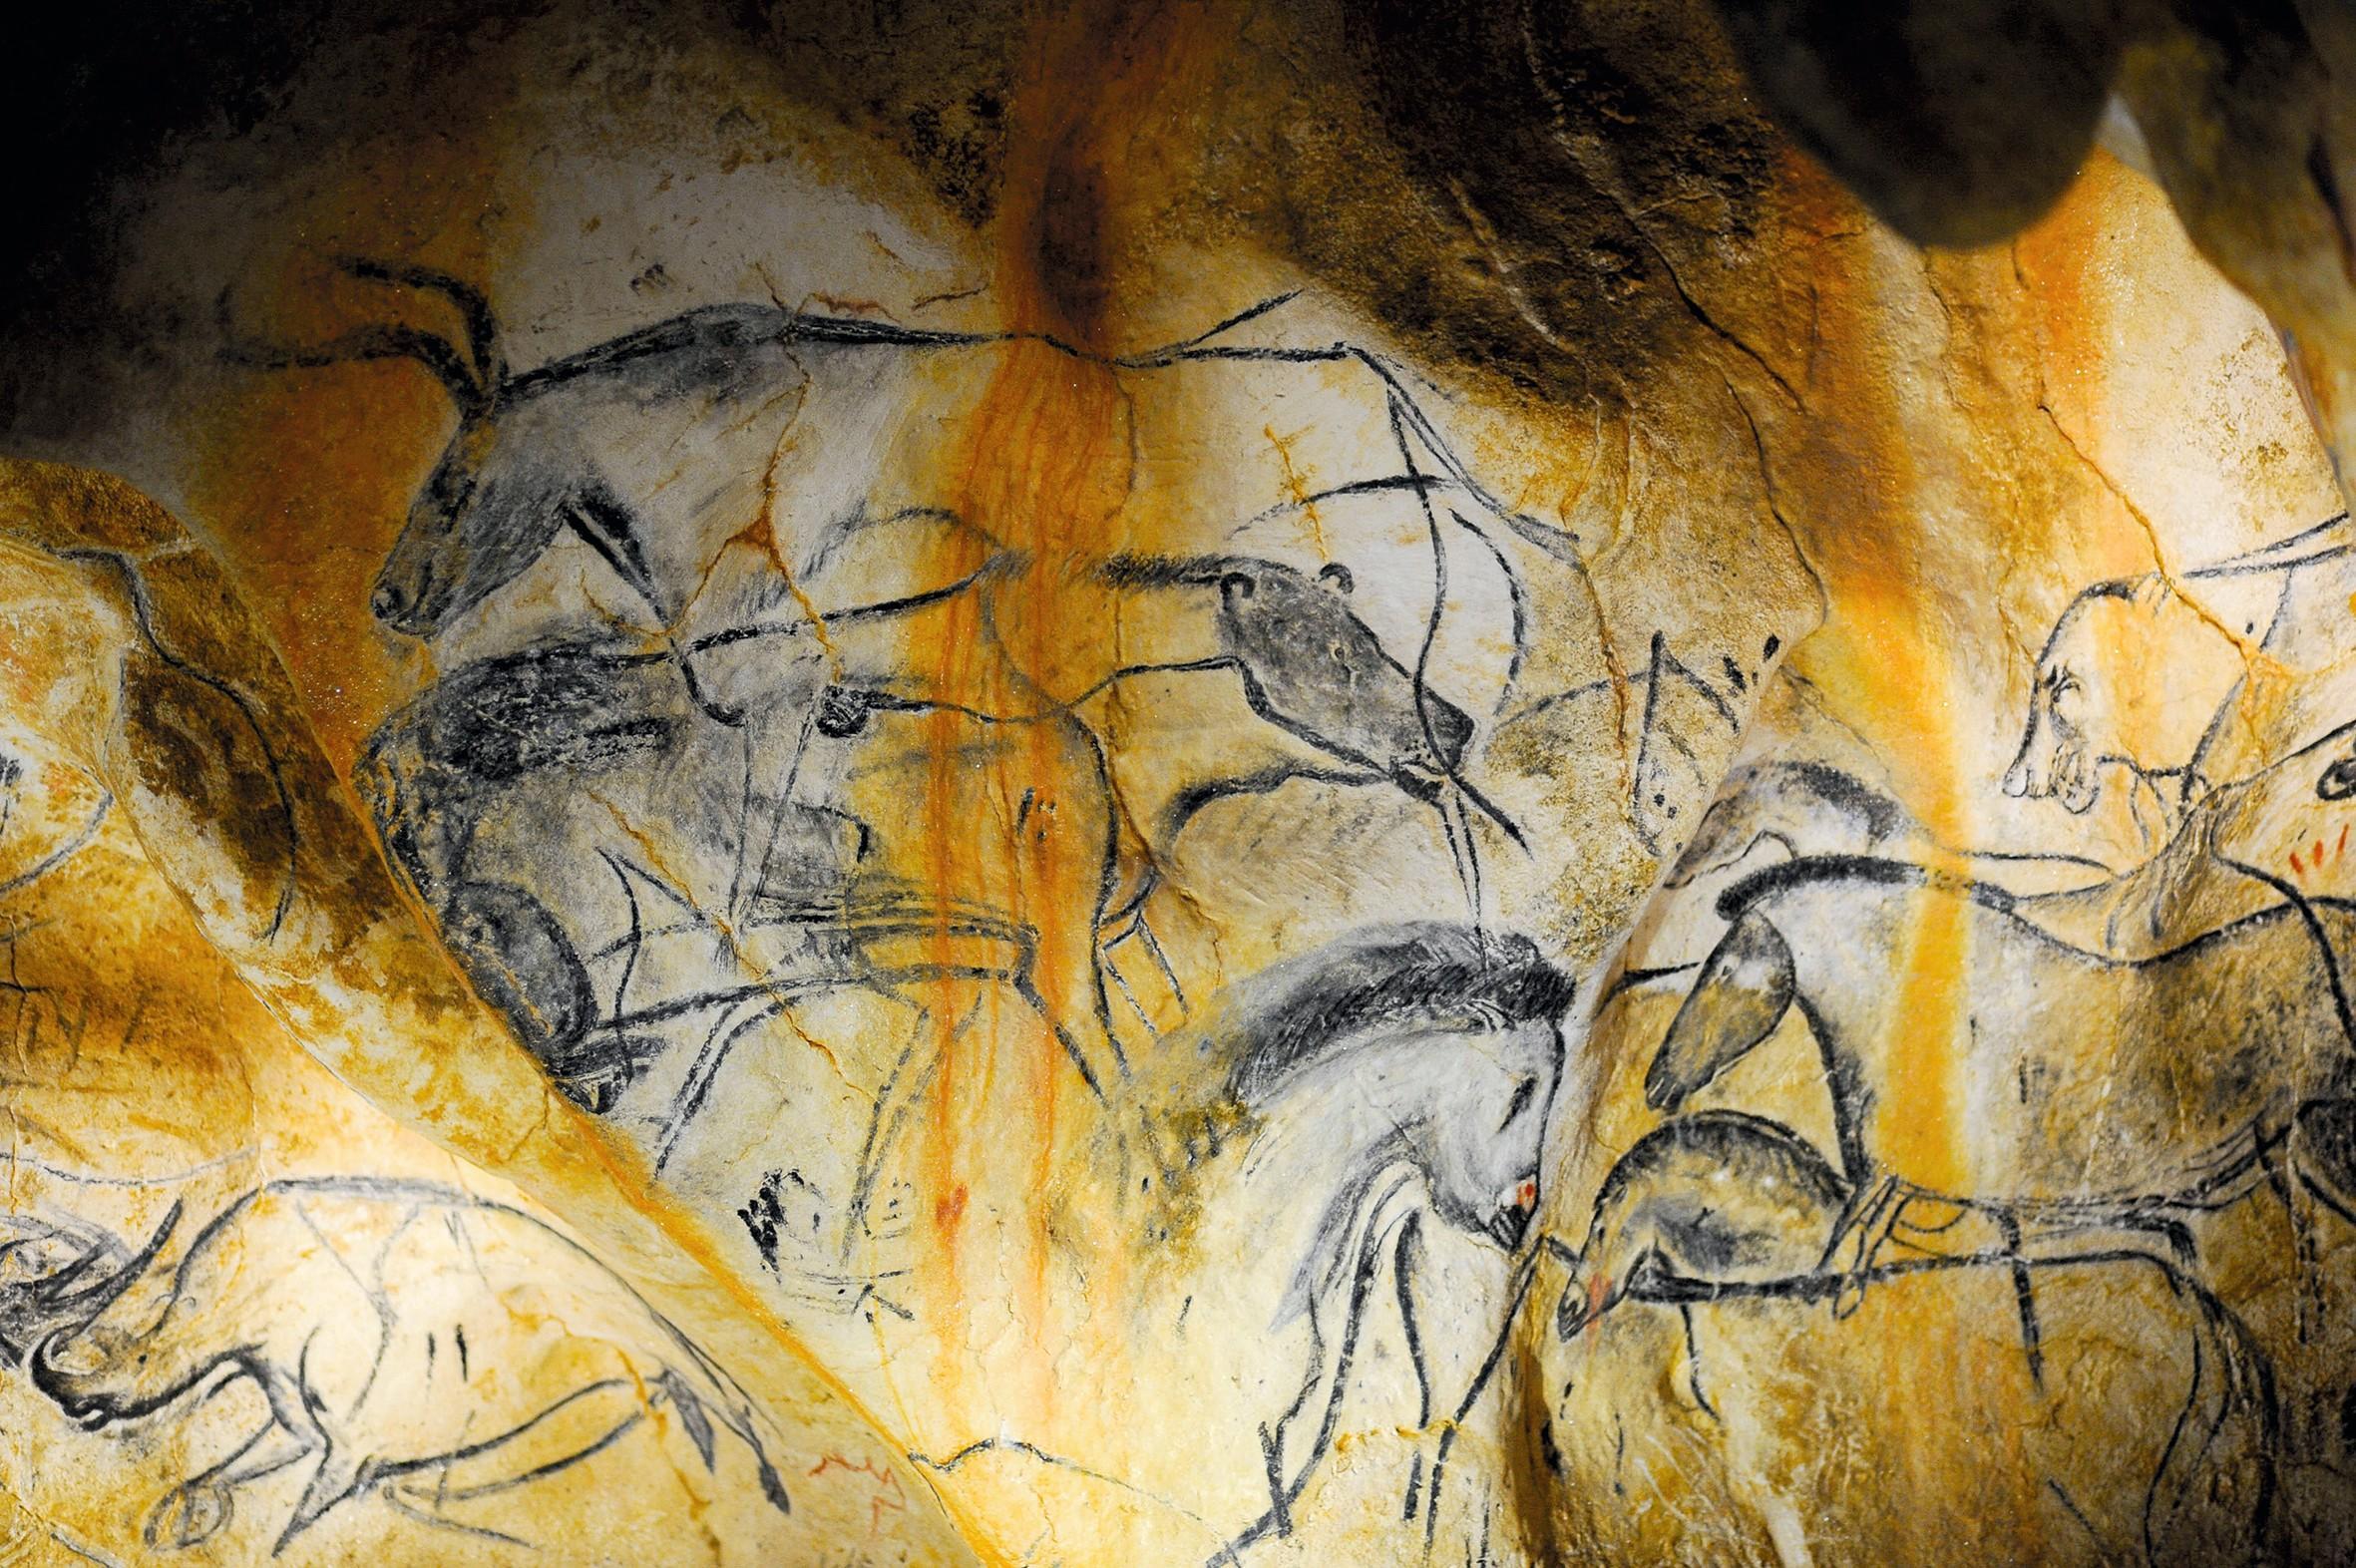 Maths spé - Exercices transversaux - exercice 40 - peintures rupestres